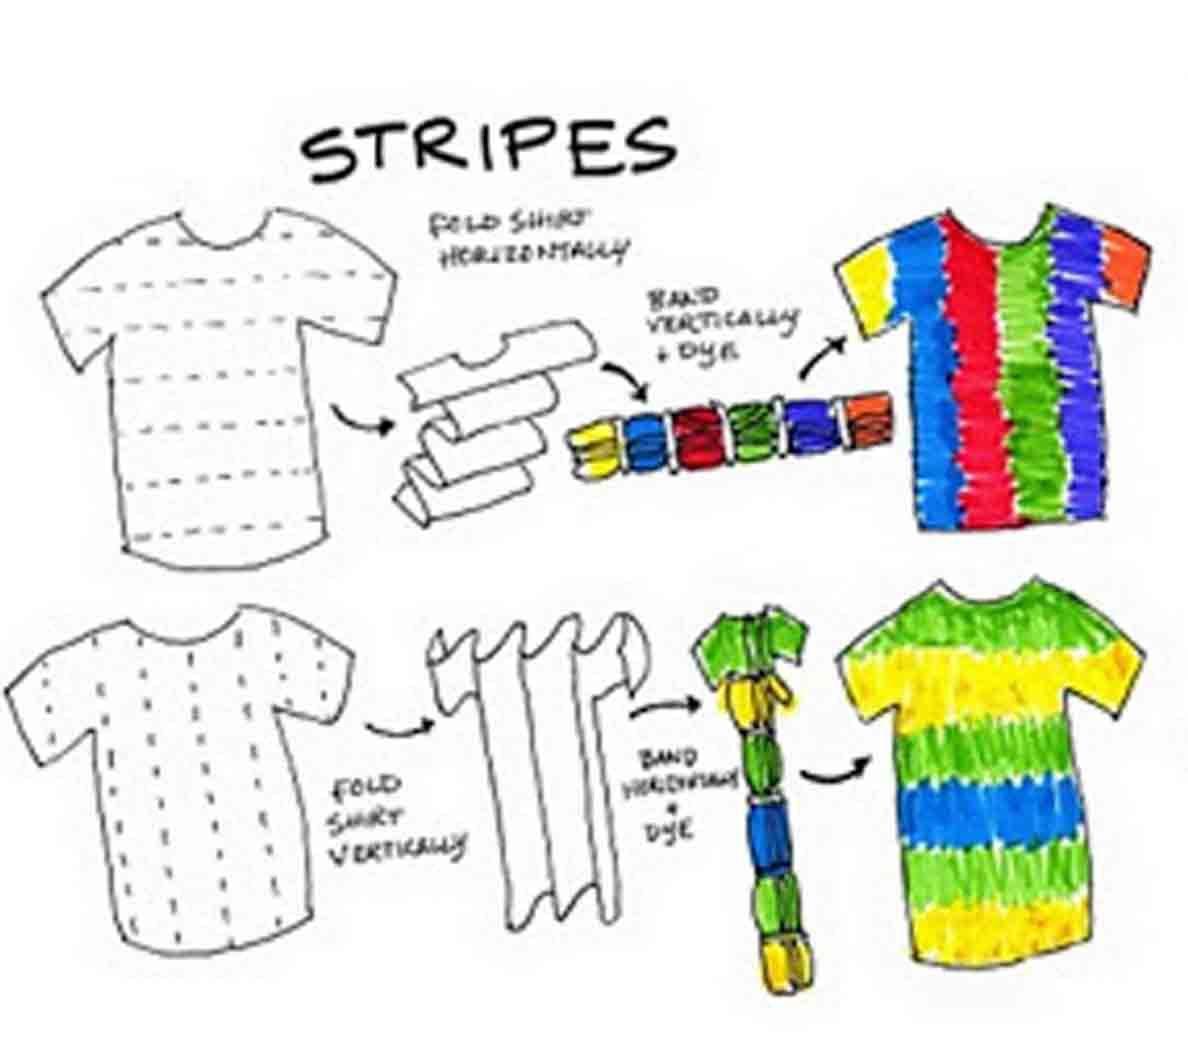 Hippie's Child Teach Yourself Tie Dye Stripes Tie dye